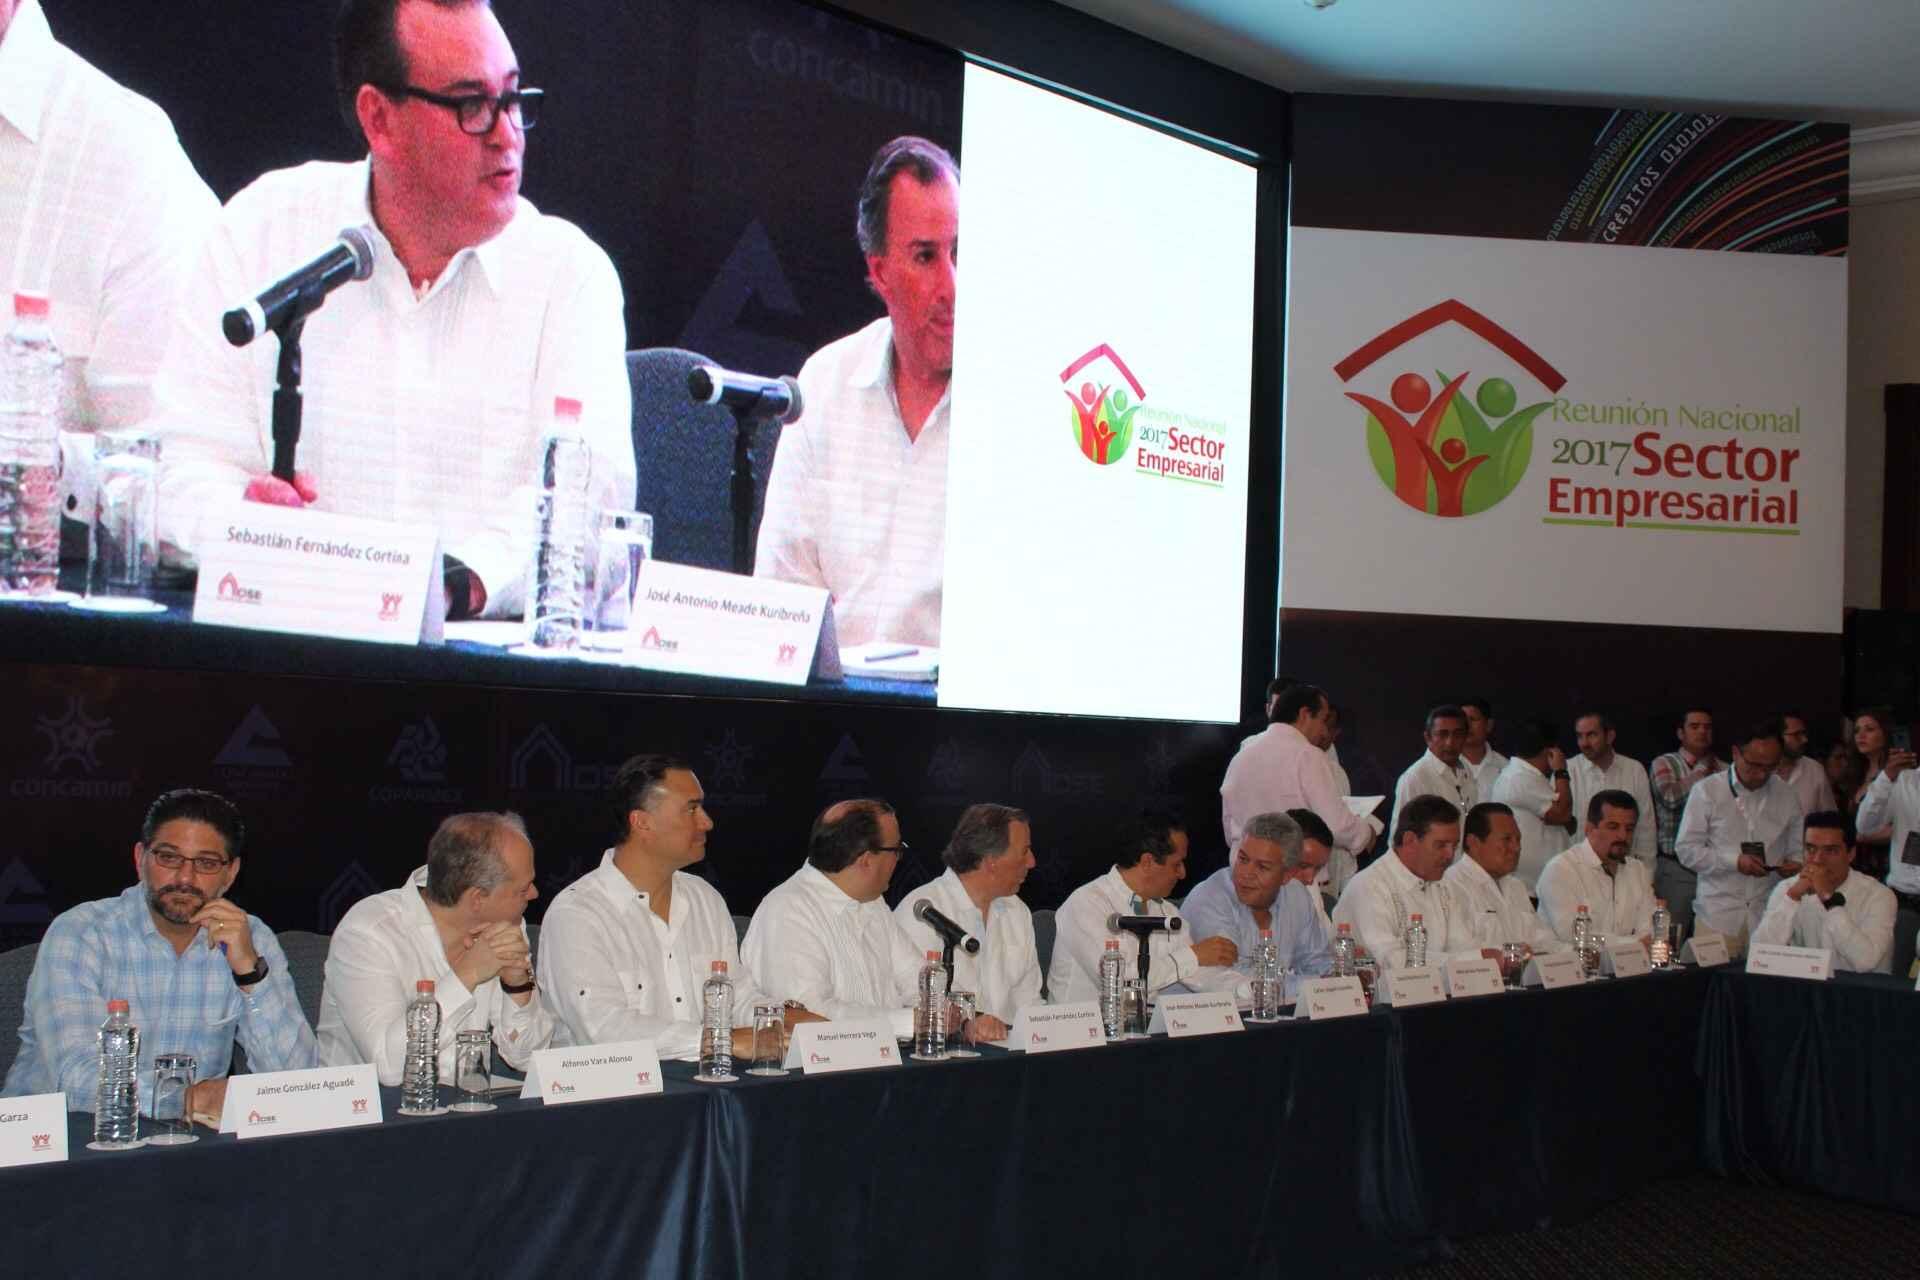 Reunión del Sector Empresarial Infonavit